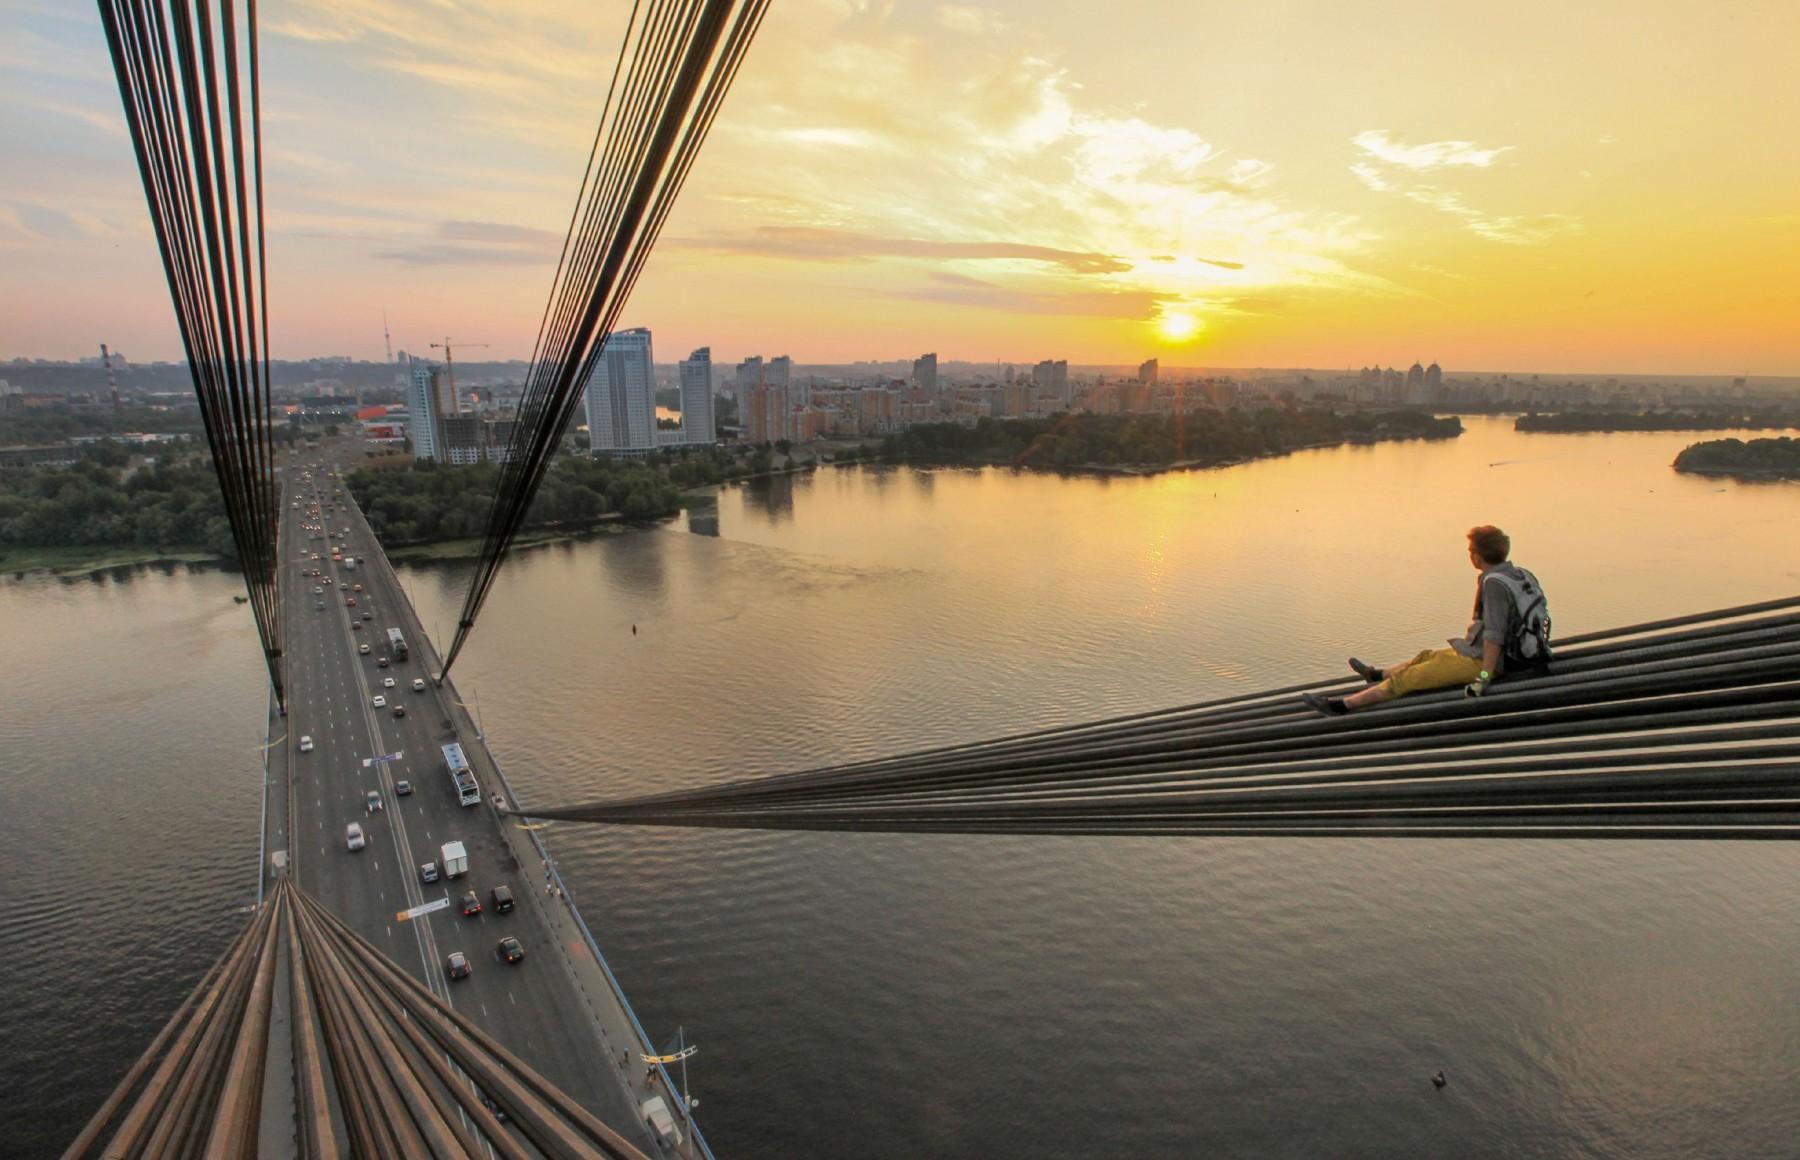 Selfie adrenaline-junkie climbers